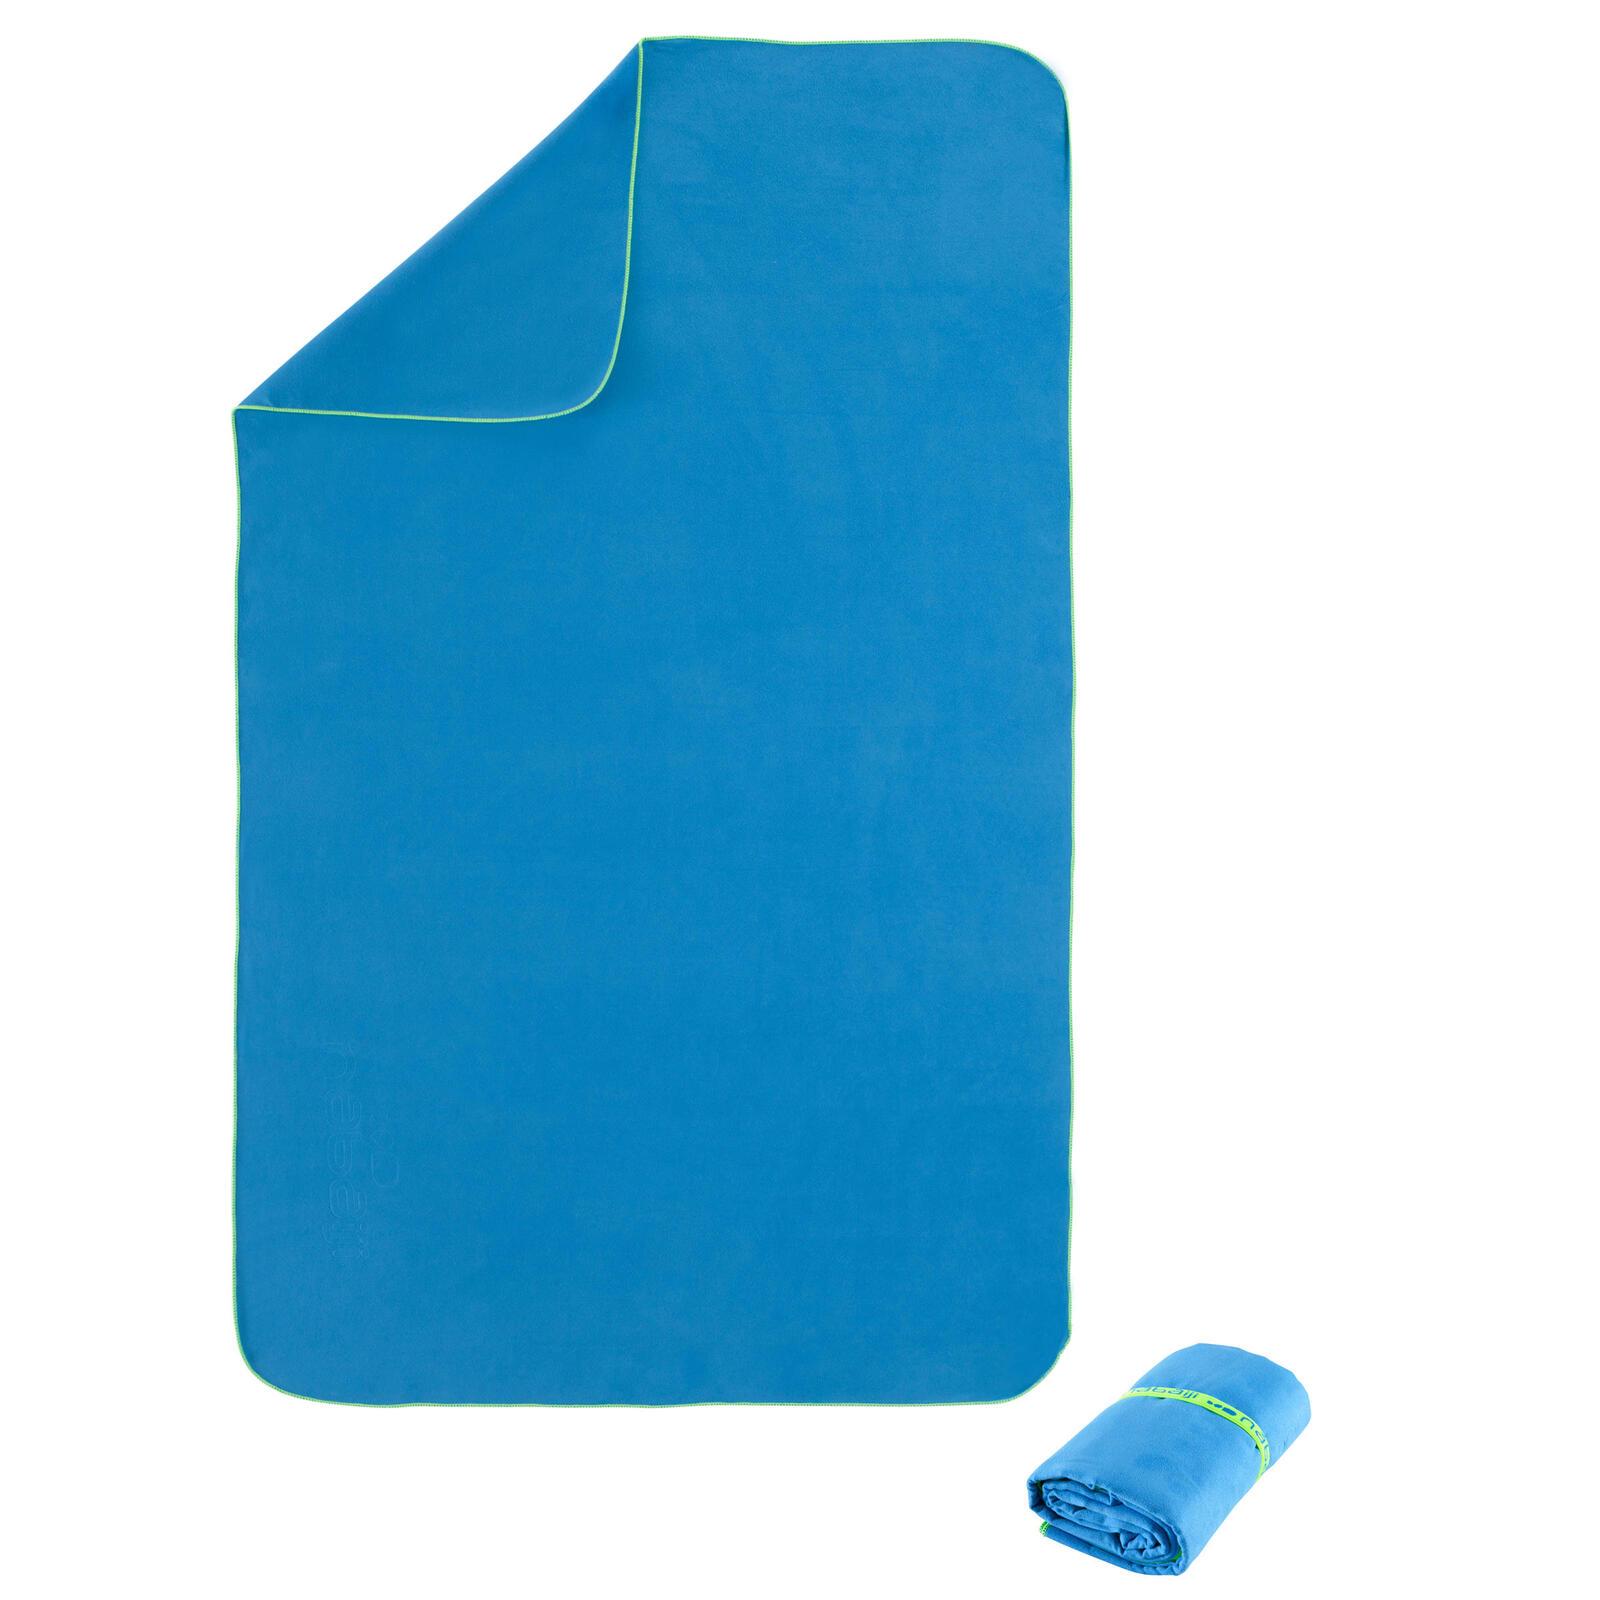 Microfibre towel ultra compact size xl